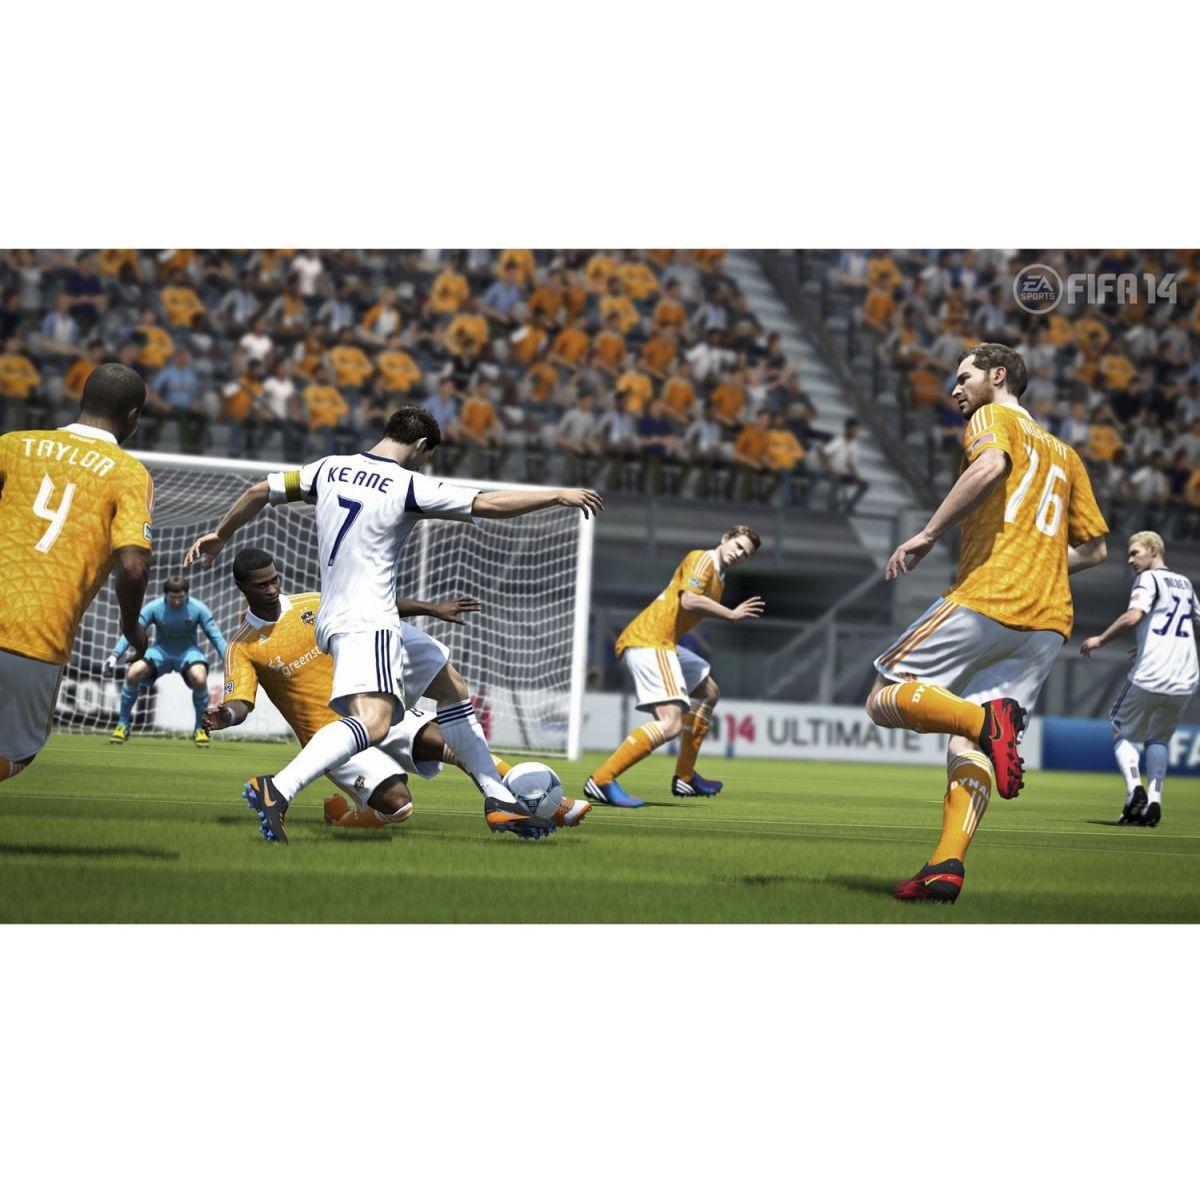 Jogo FIFA 14 para PS3 - EA